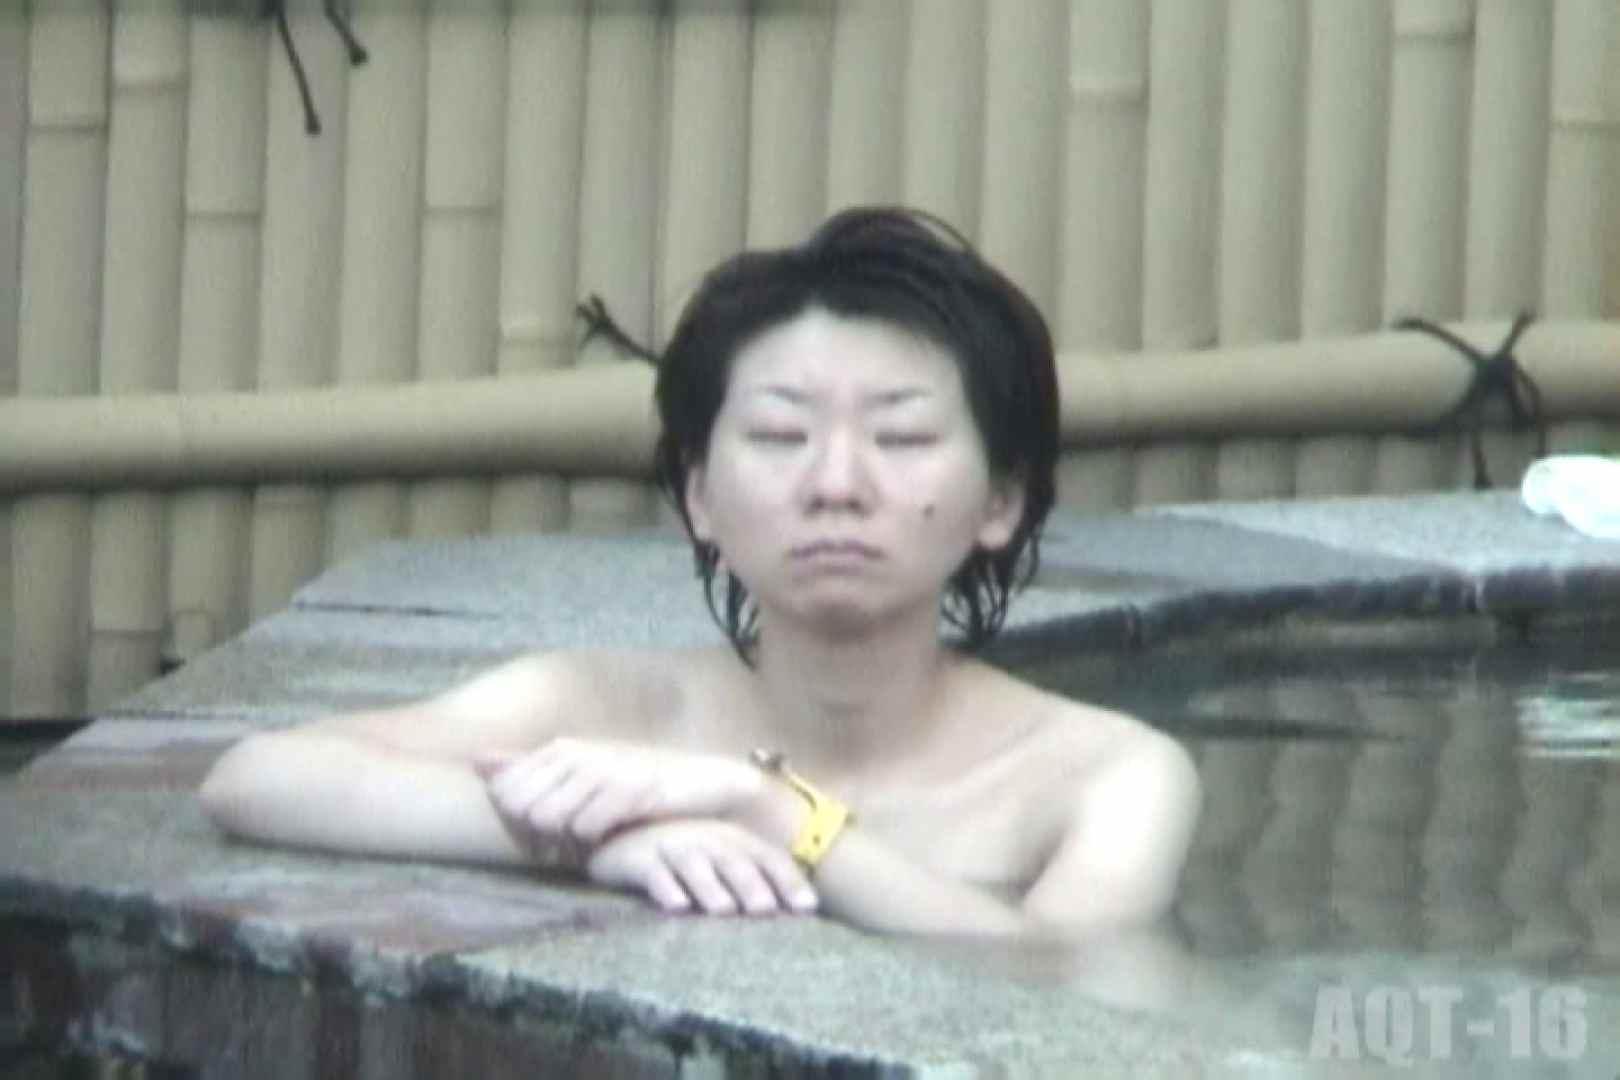 Aquaな露天風呂Vol.842 0 | 0  32連発 26